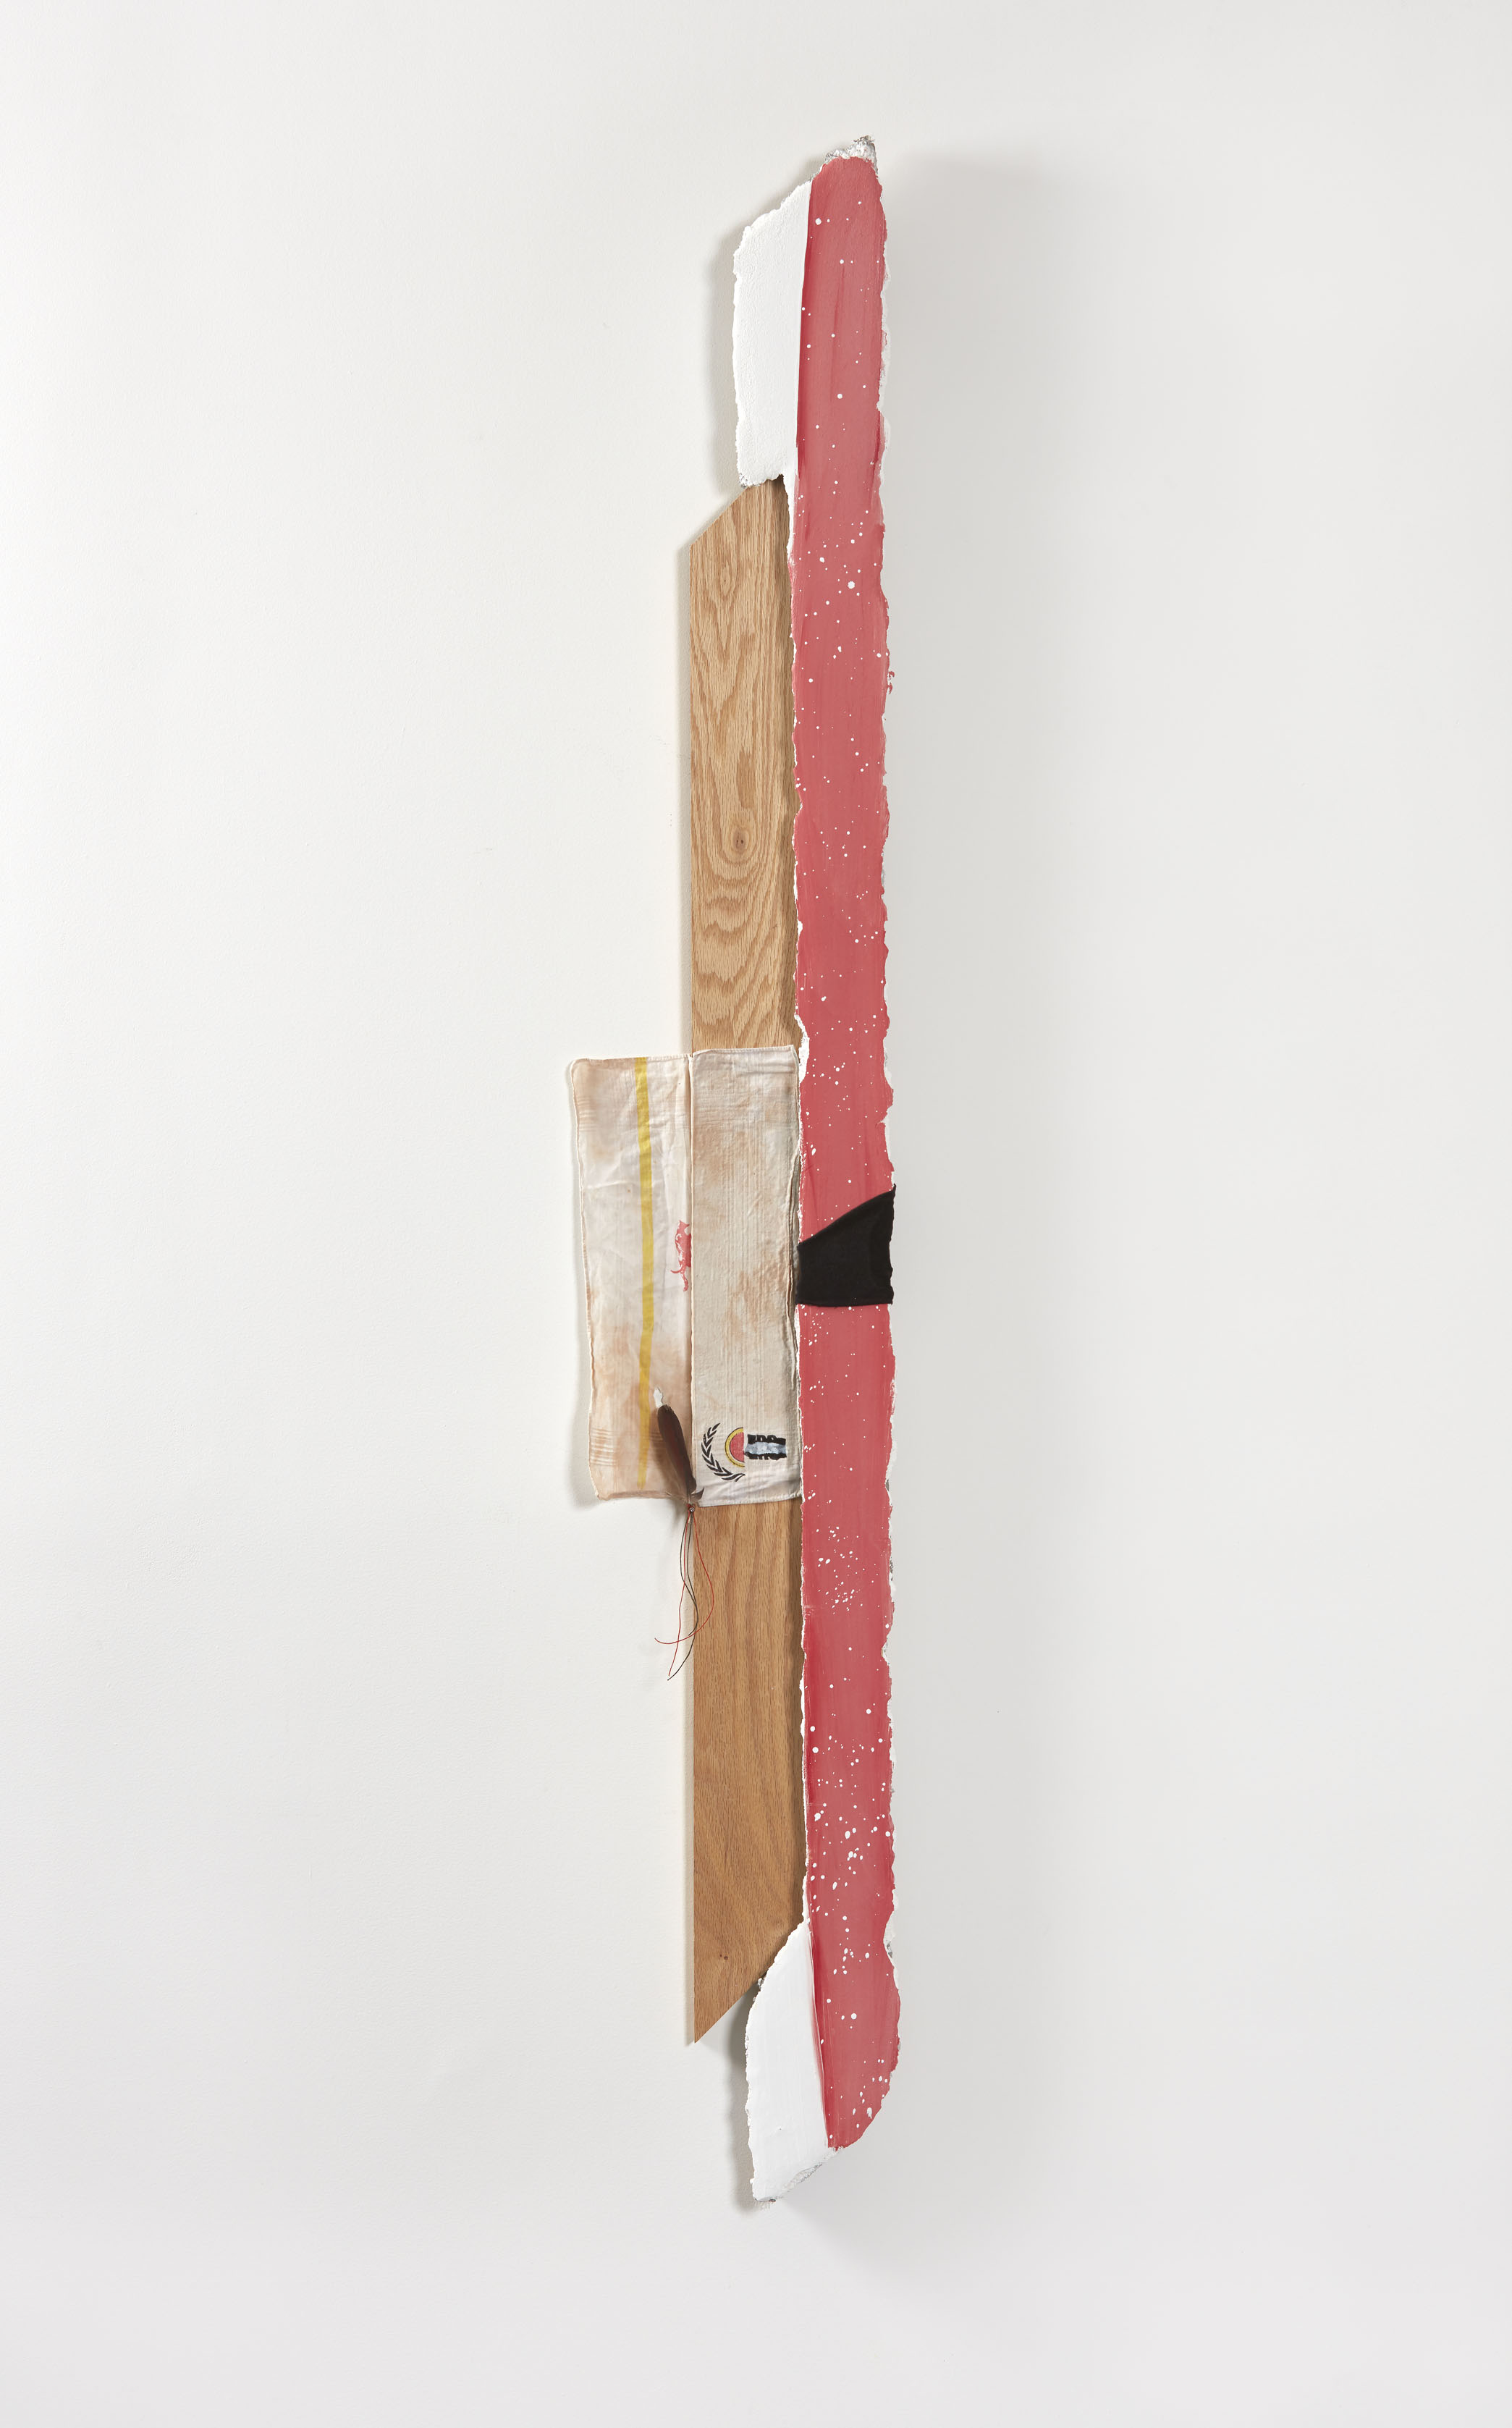 Untitled Threshold